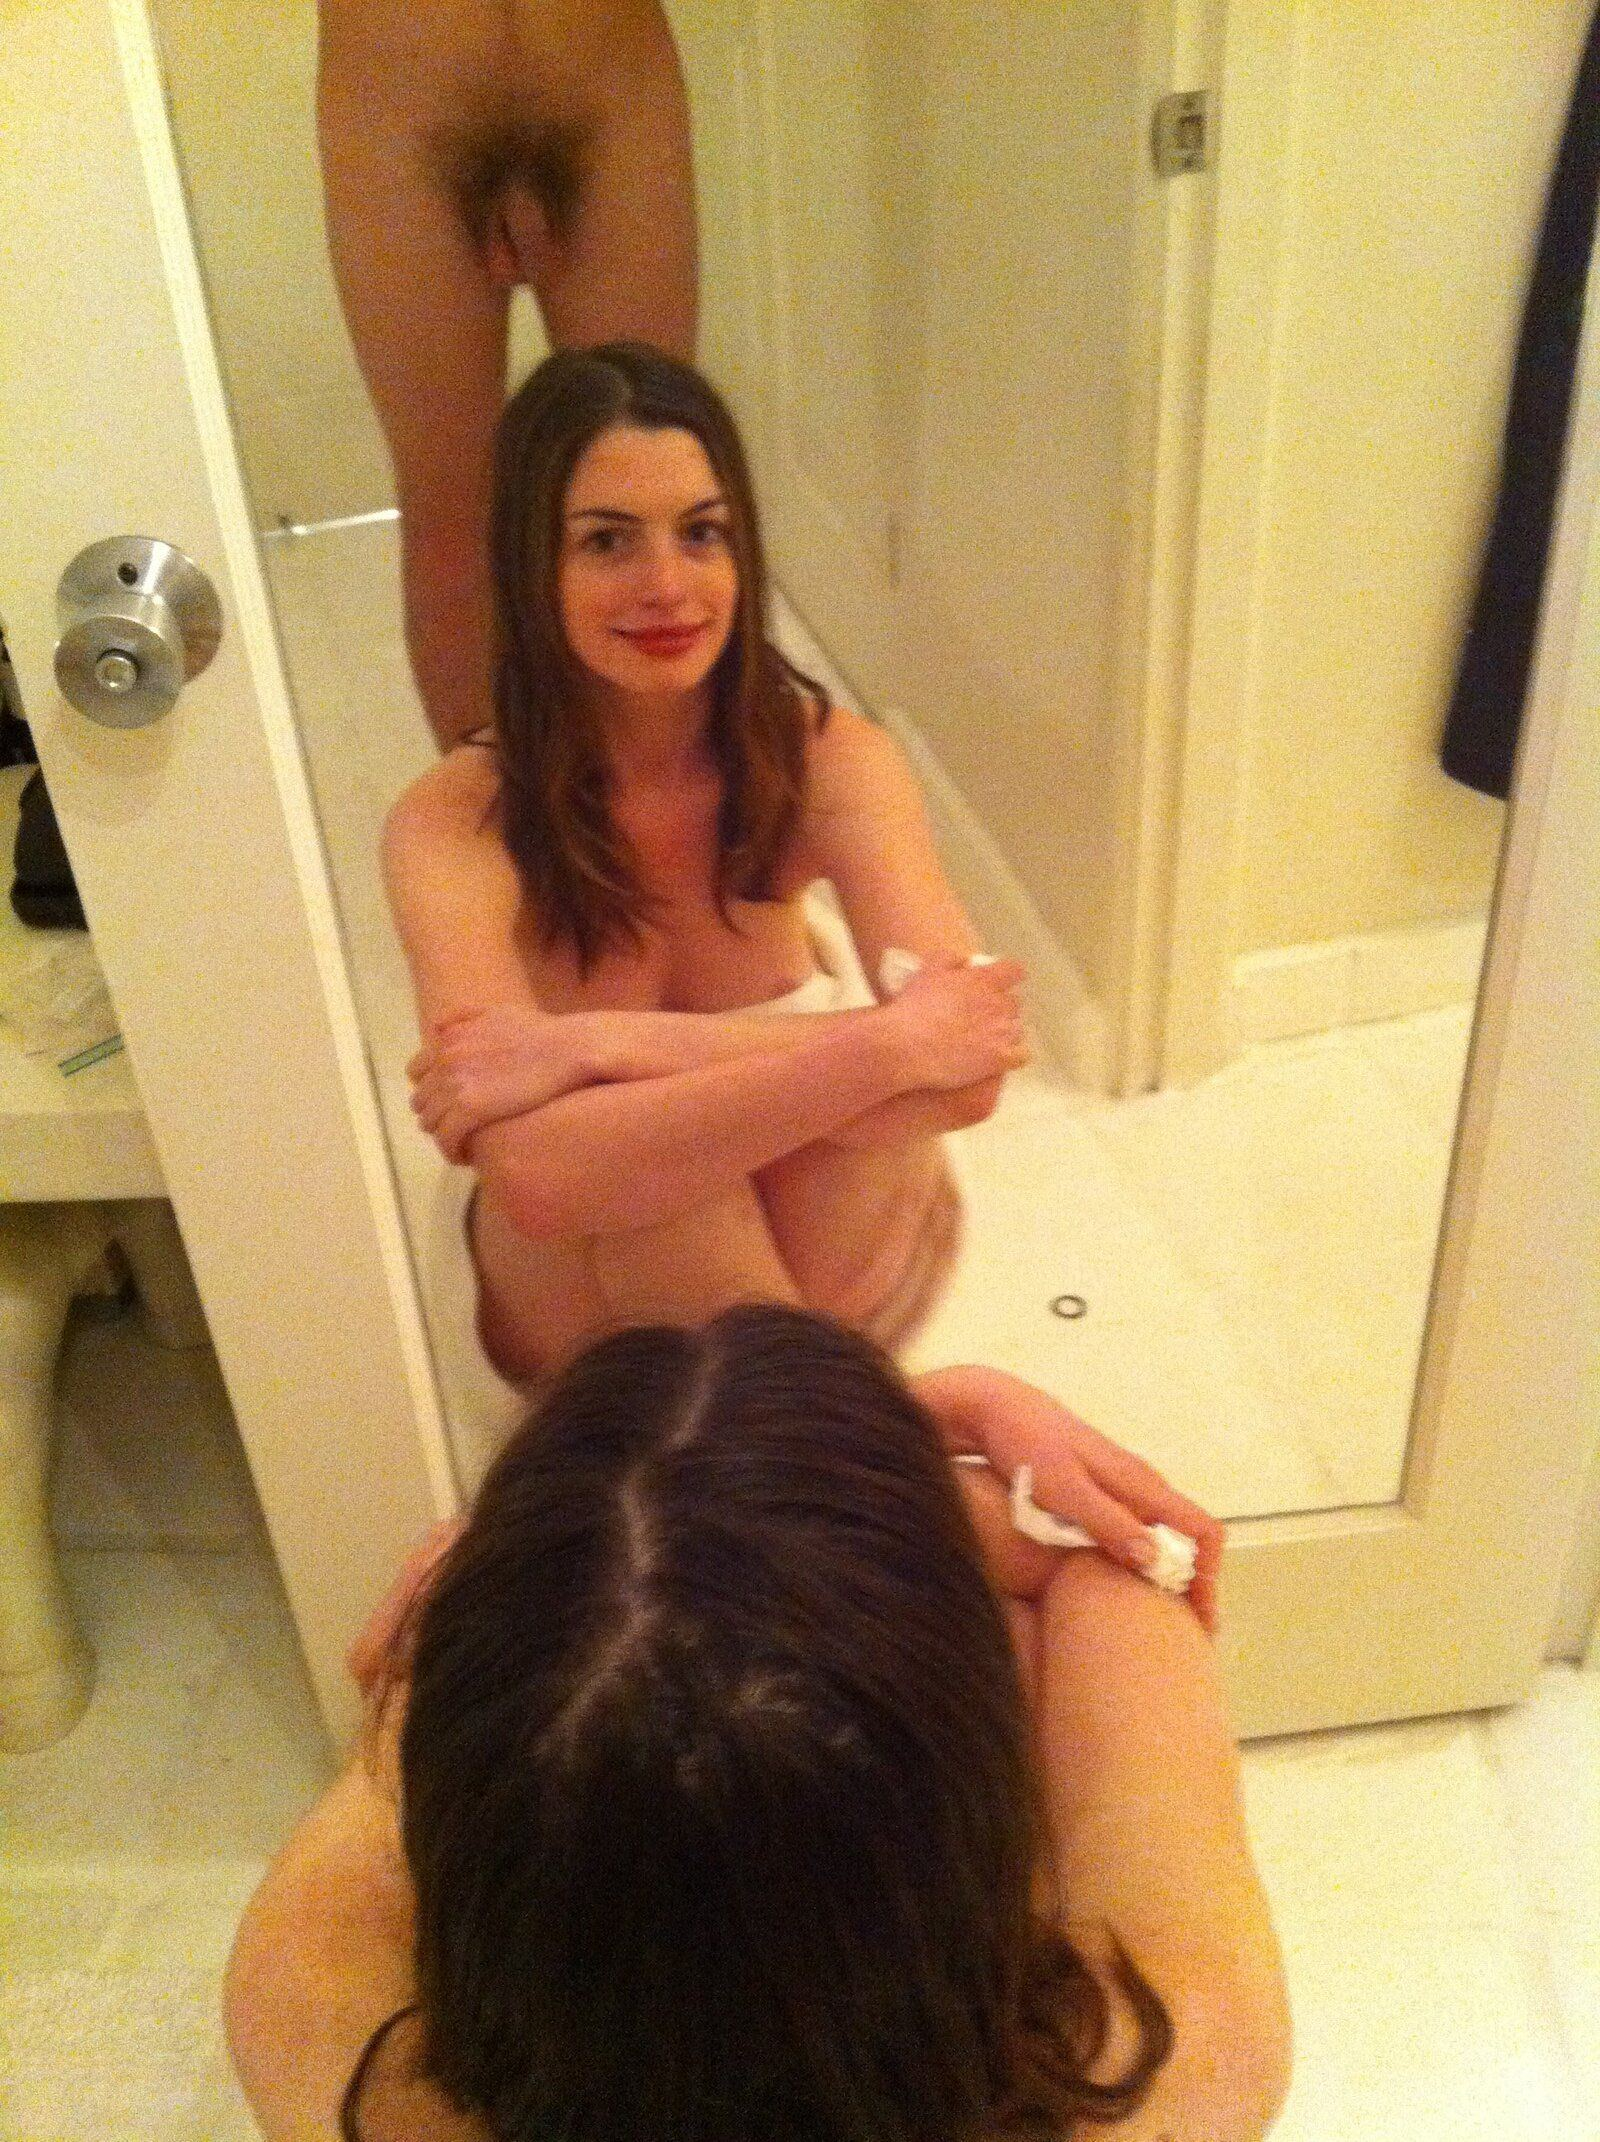 Anne Hathaway Porno anne hathaway naked at the door - xxx sex photos.